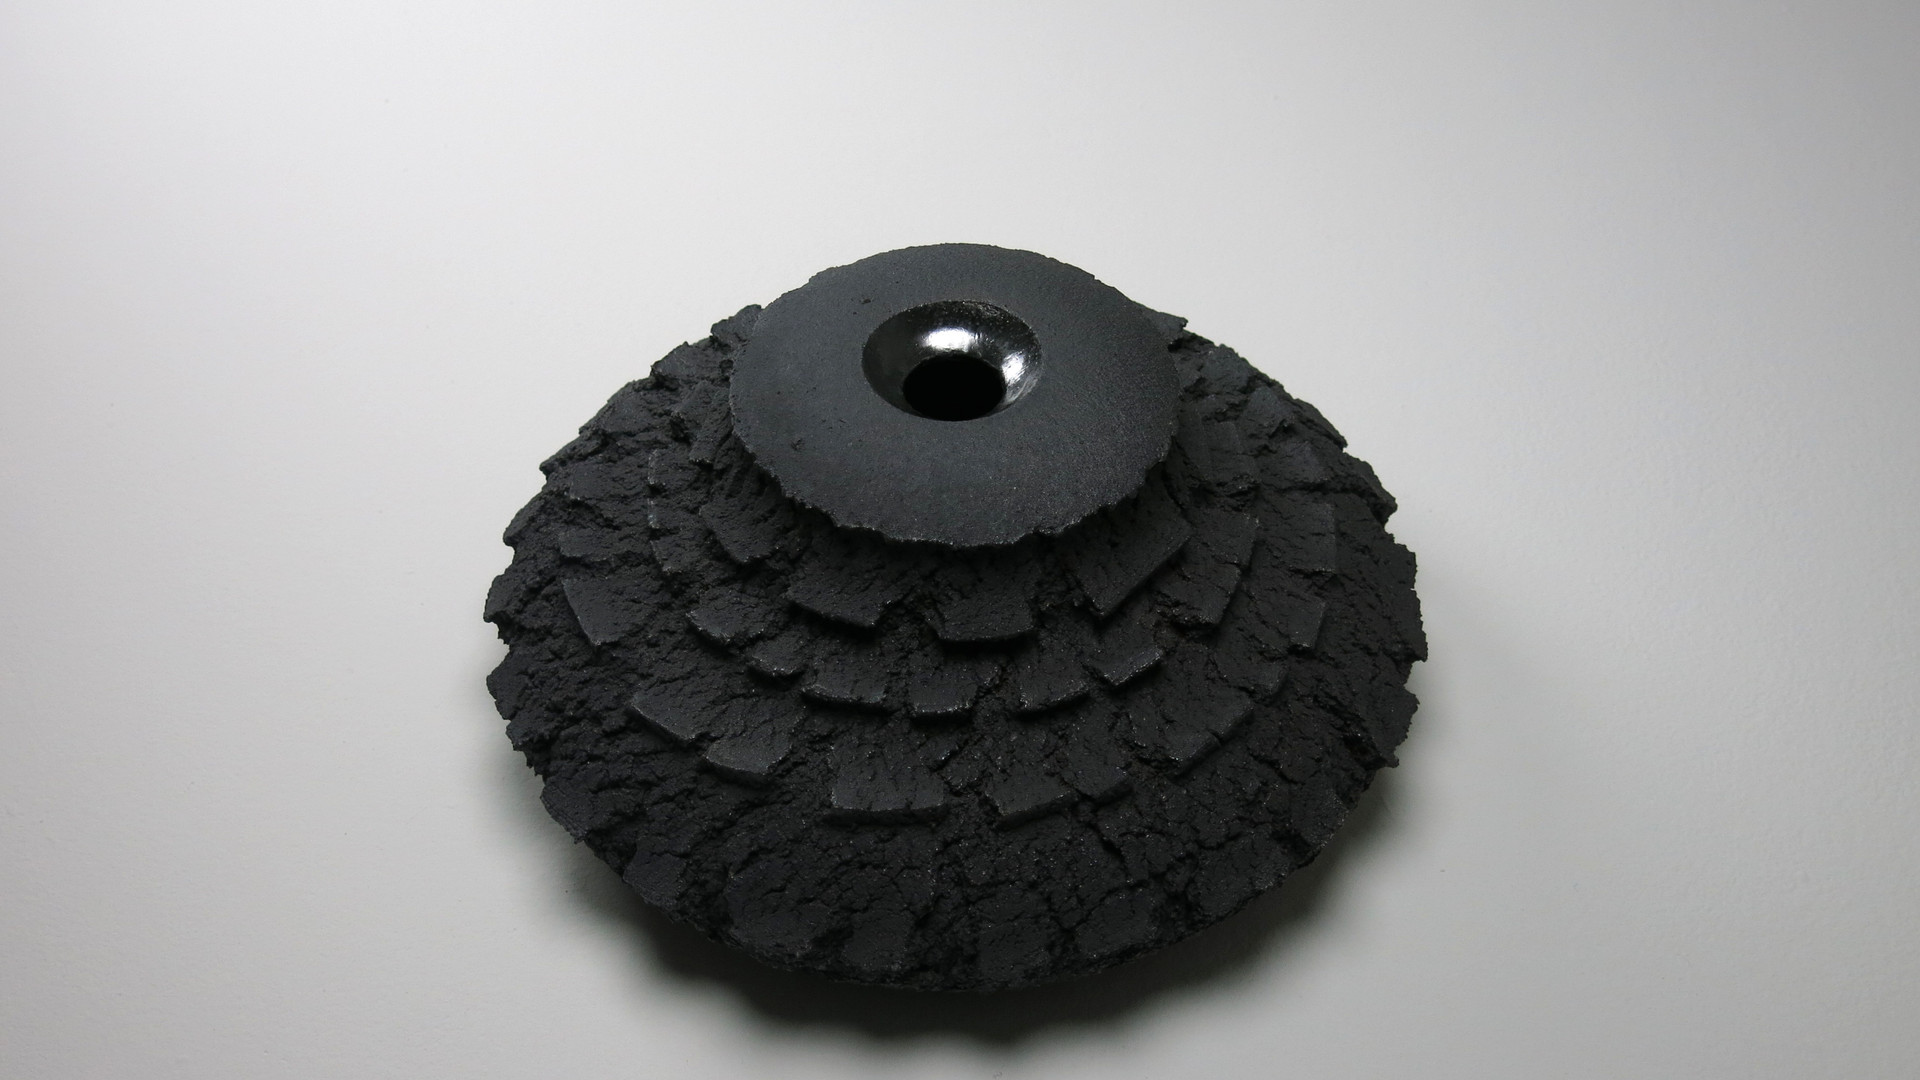 7._BLACK_VASE.JPG